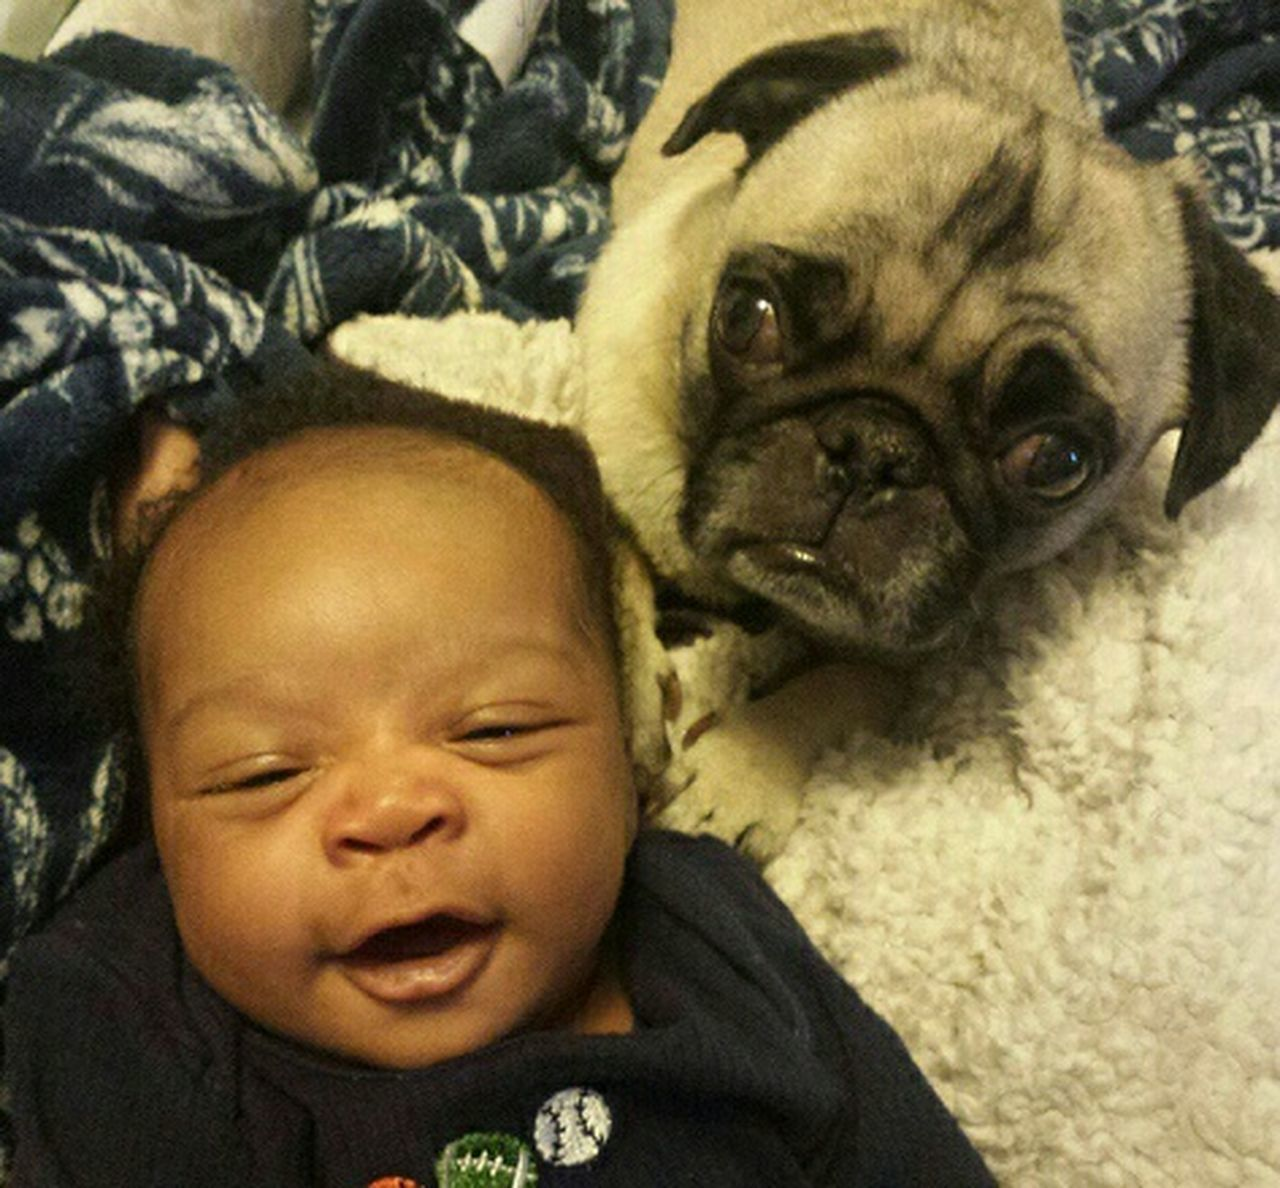 Puggies&babies